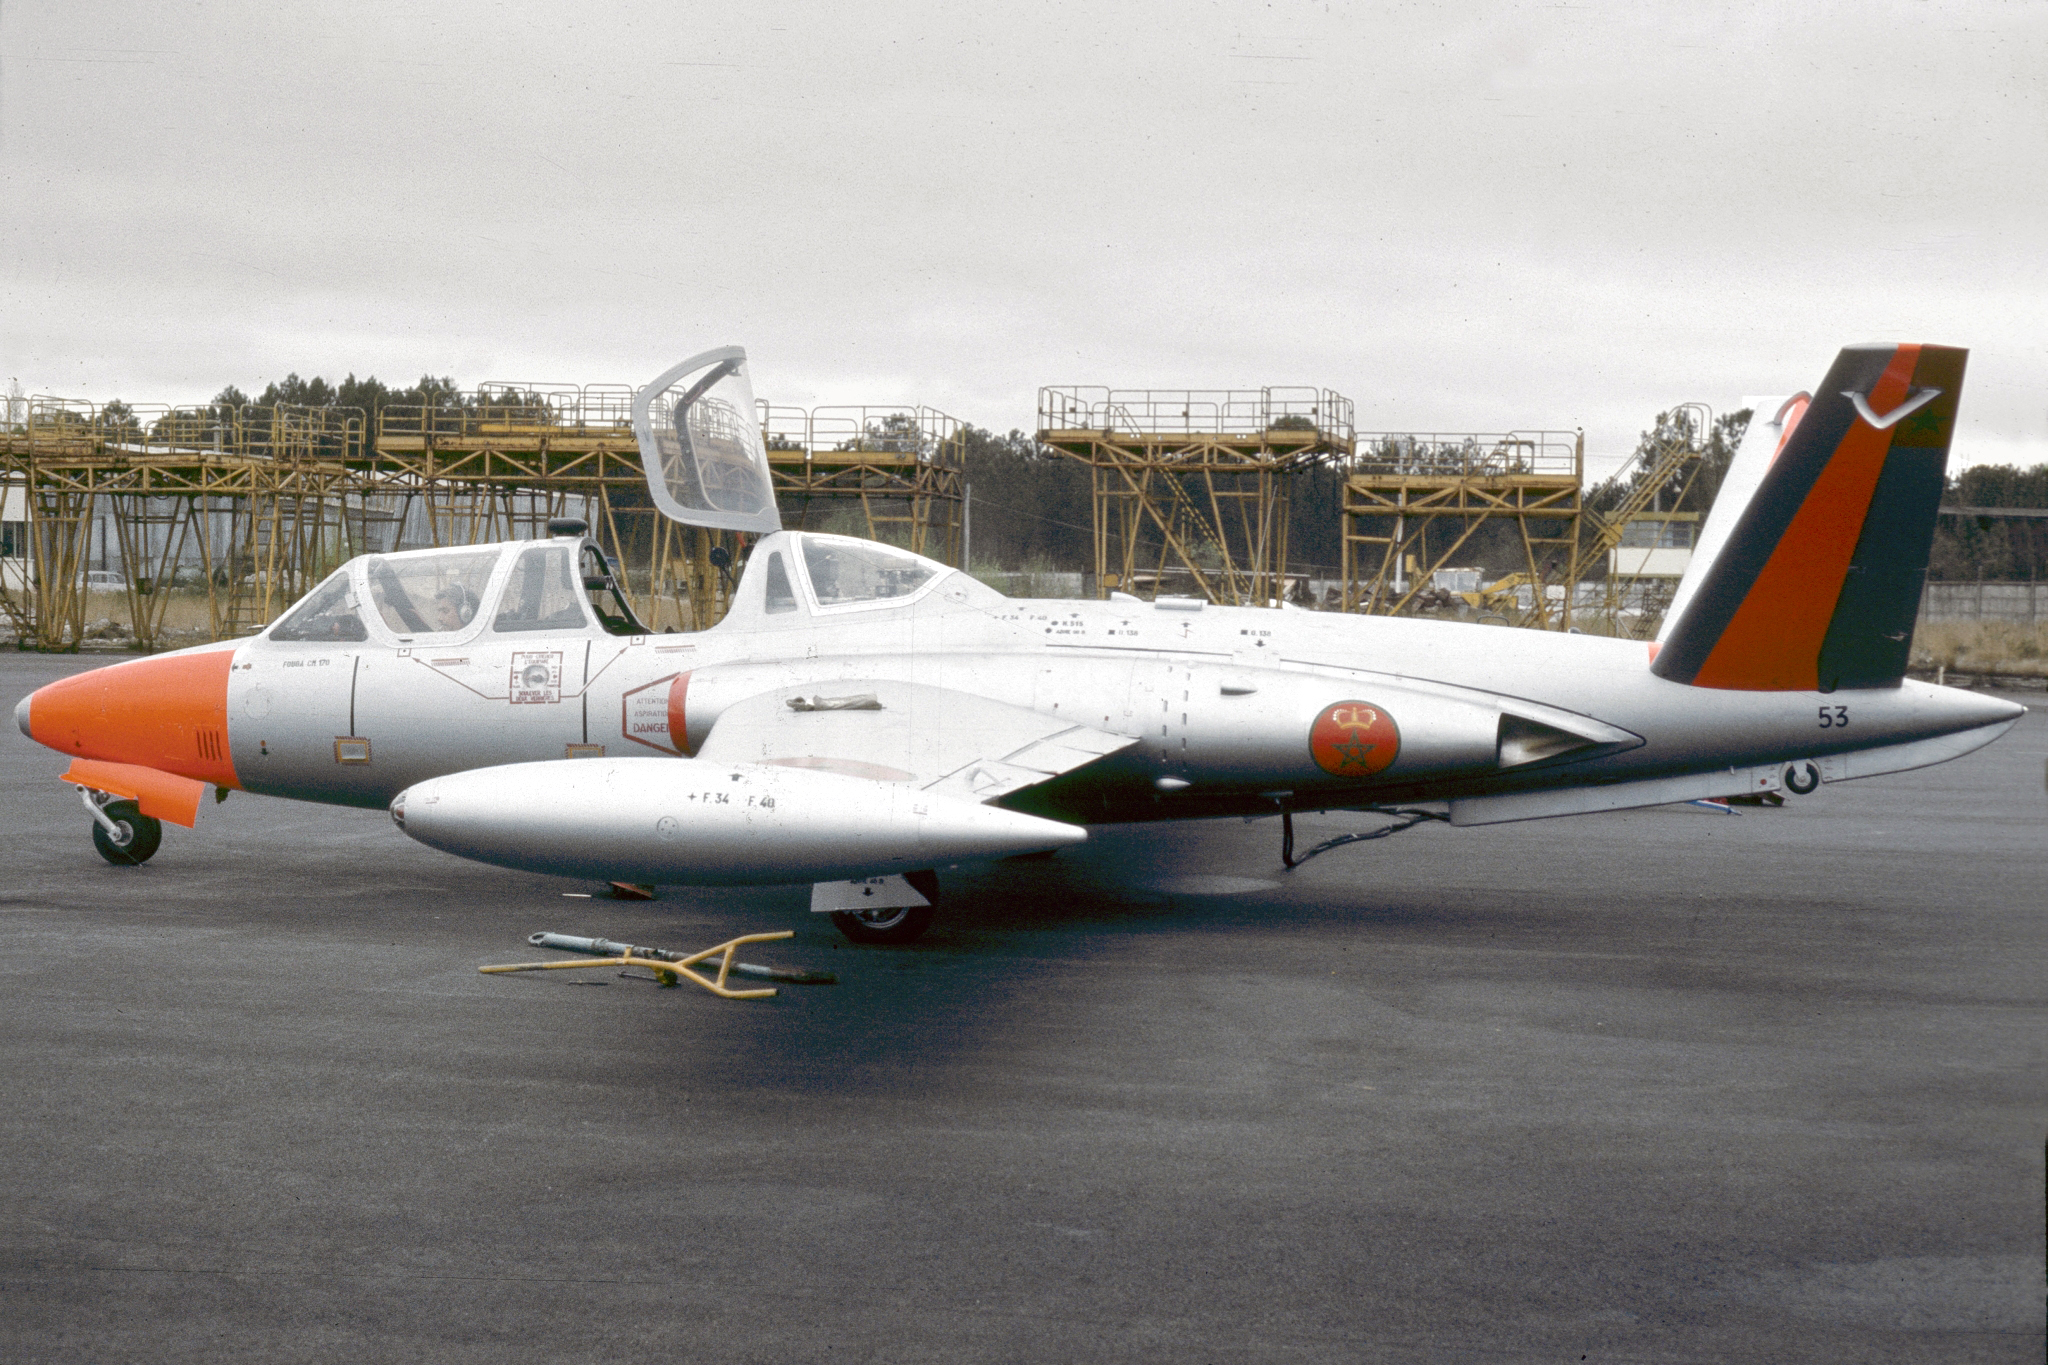 FRA: Photos anciens avions des FRA - Page 13 31192368432_433f08dc2a_o_d